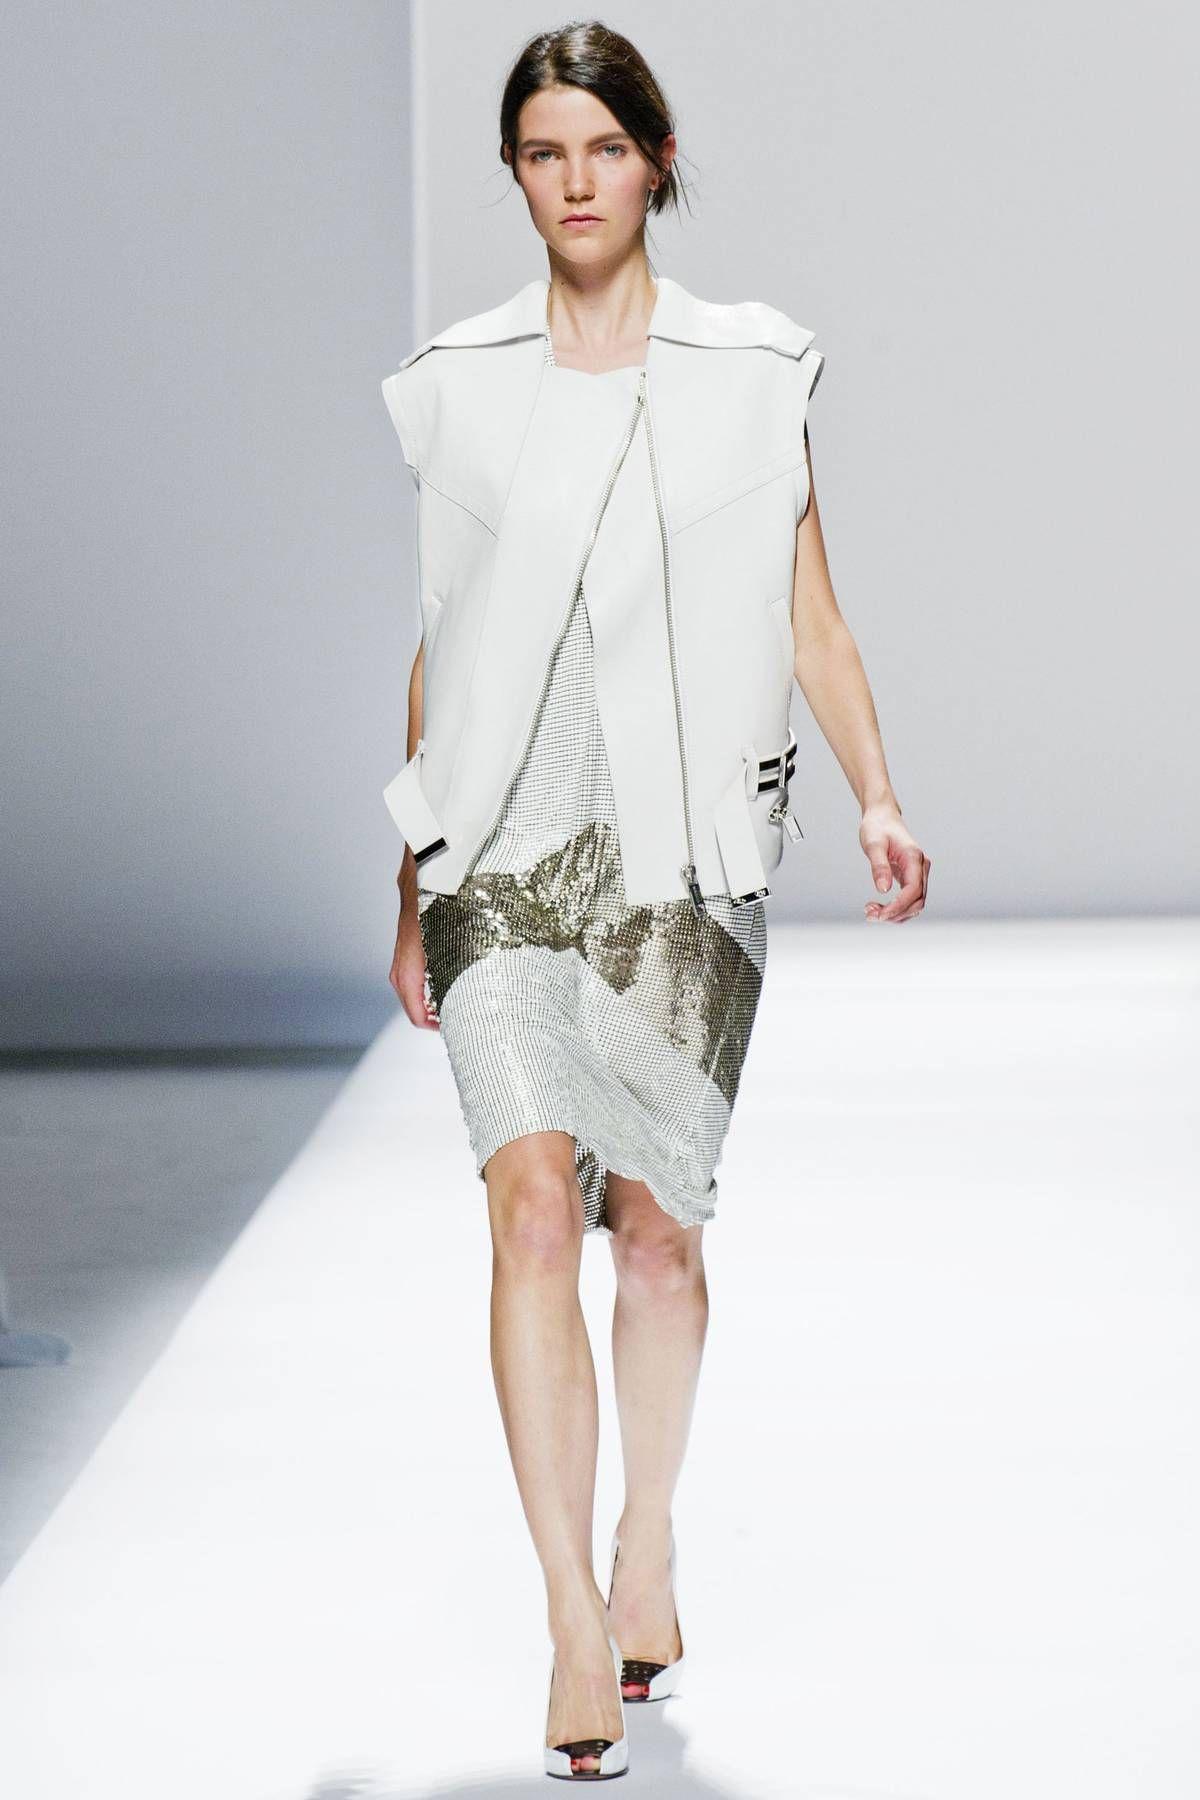 Sportmax Spring 2013 RTW Collection - Fashion on TheCut